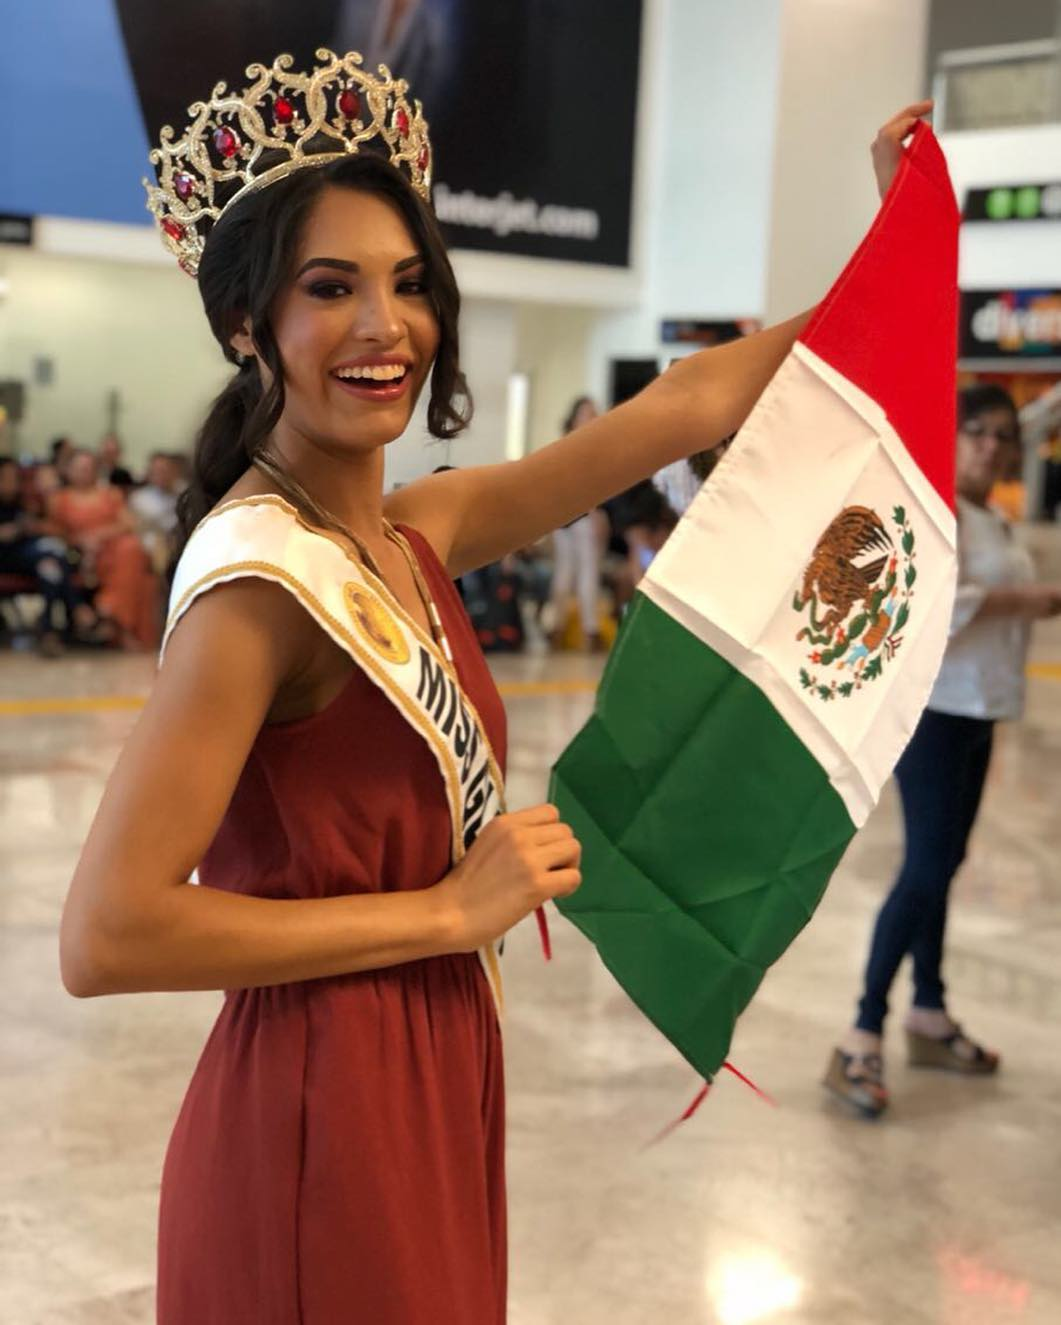 joely oralia garcia navarro, world miss tourism mexico 2018/miss globe mexico 2017. - Página 2 36972210